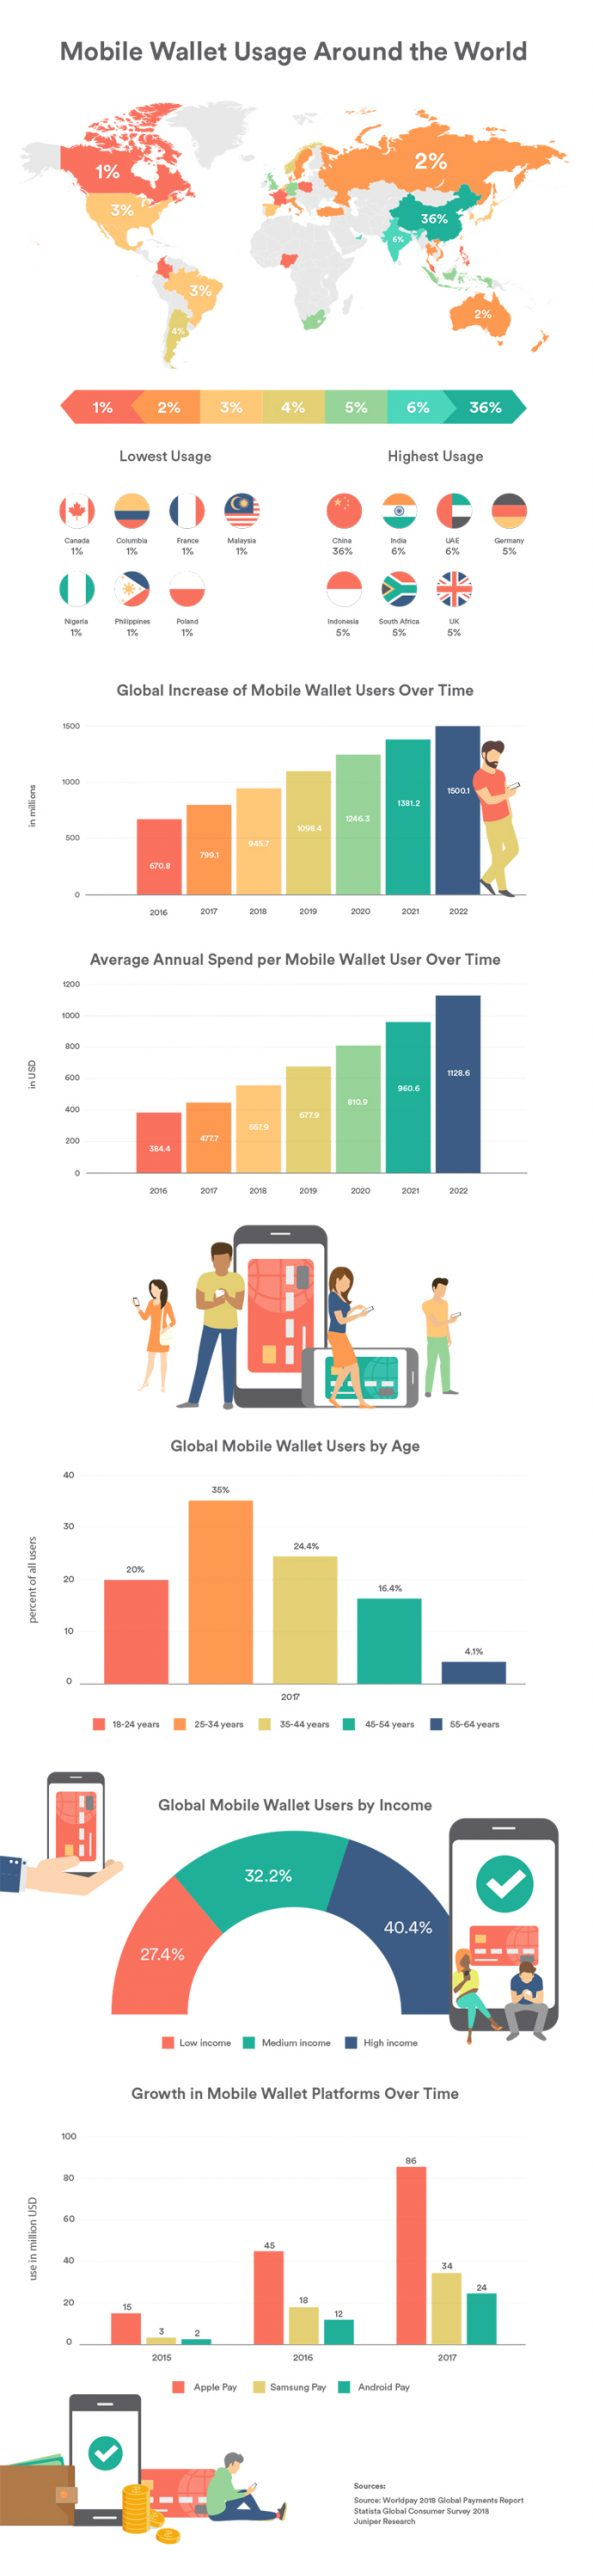 mobile usage across globe